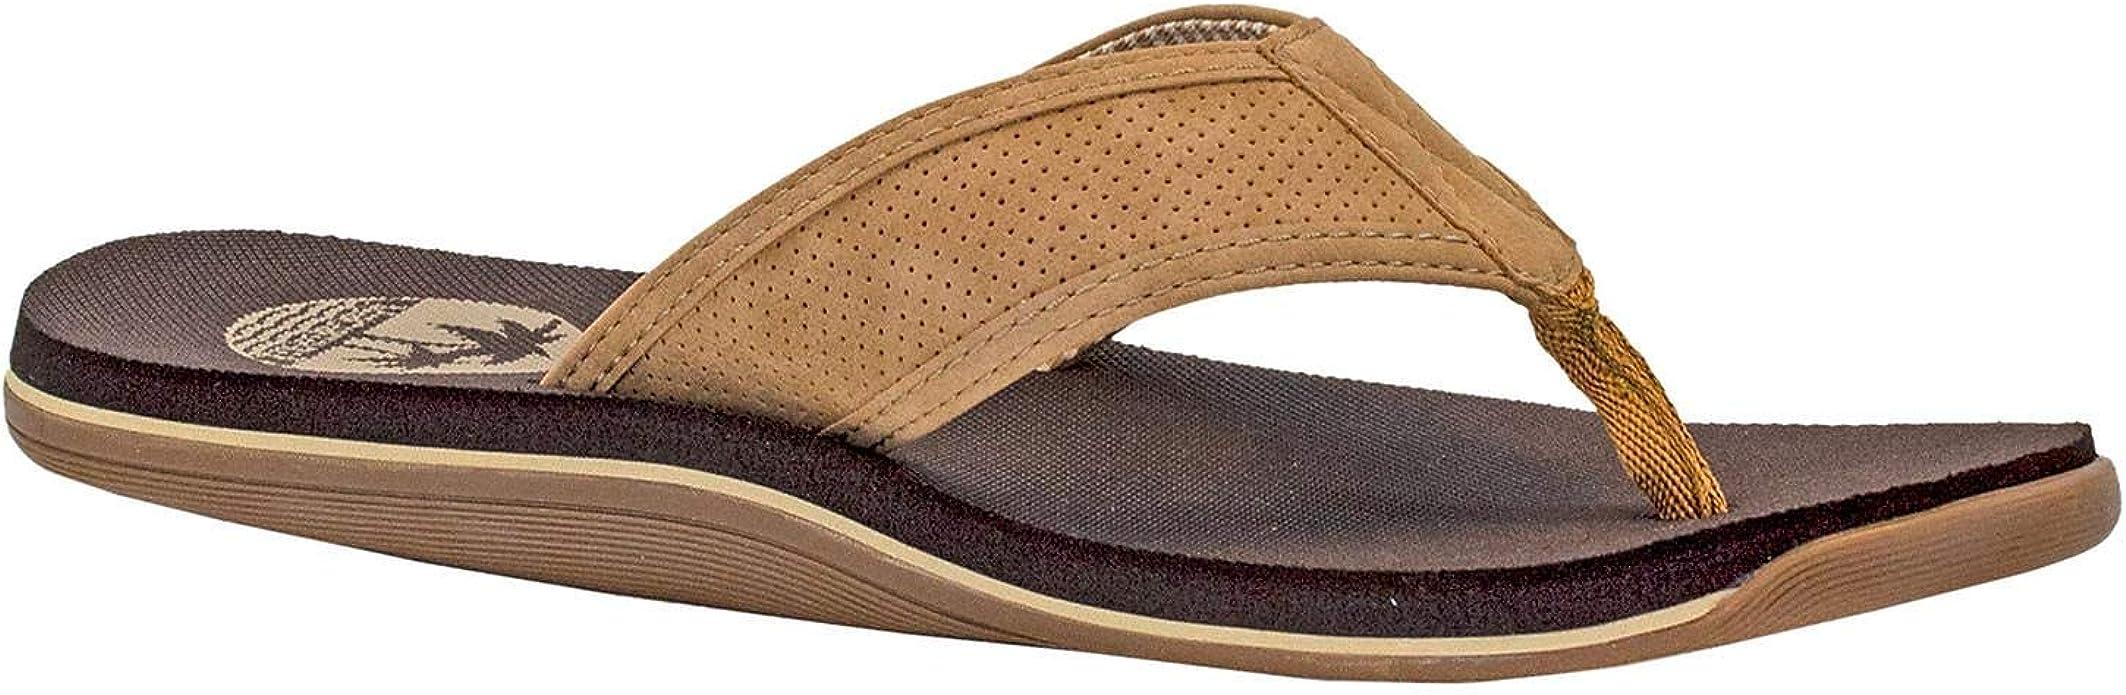 Size 11 New  WB Men/'s  MARGARITAVILLE Tan  Leather Slides Sandals Shoes